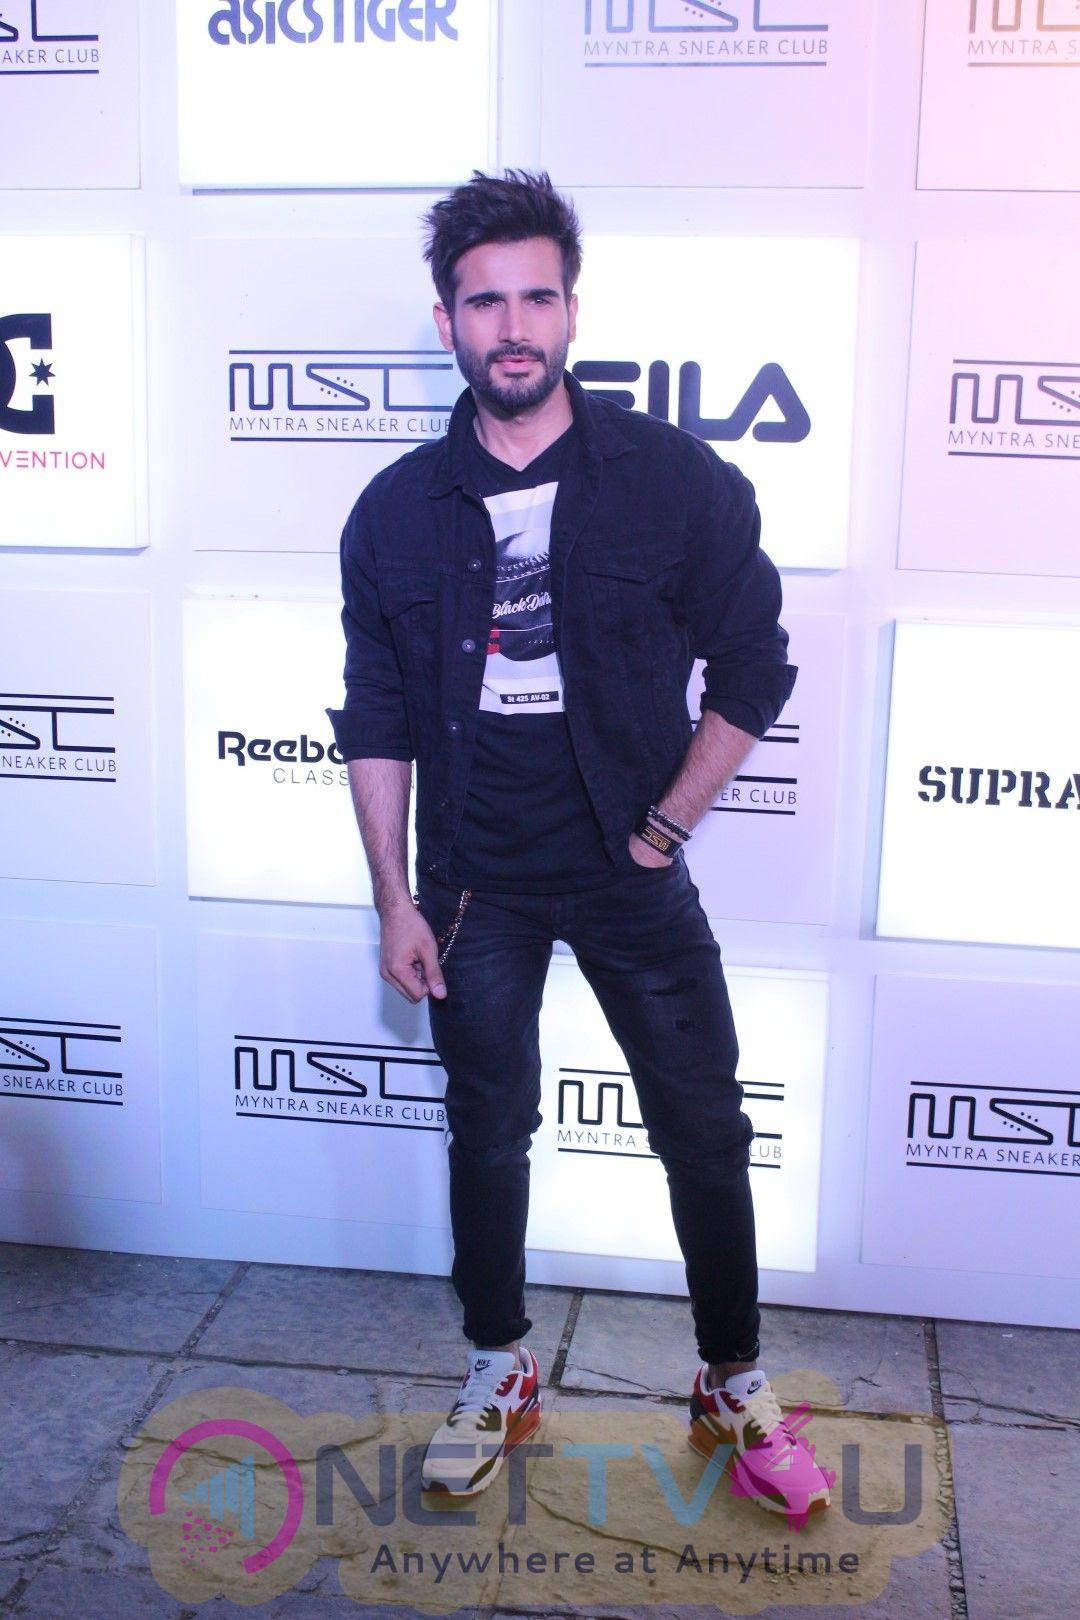 Myntra Sneaker Club Organised Pub Crawl With Many Celebrities Pics Hindi Gallery